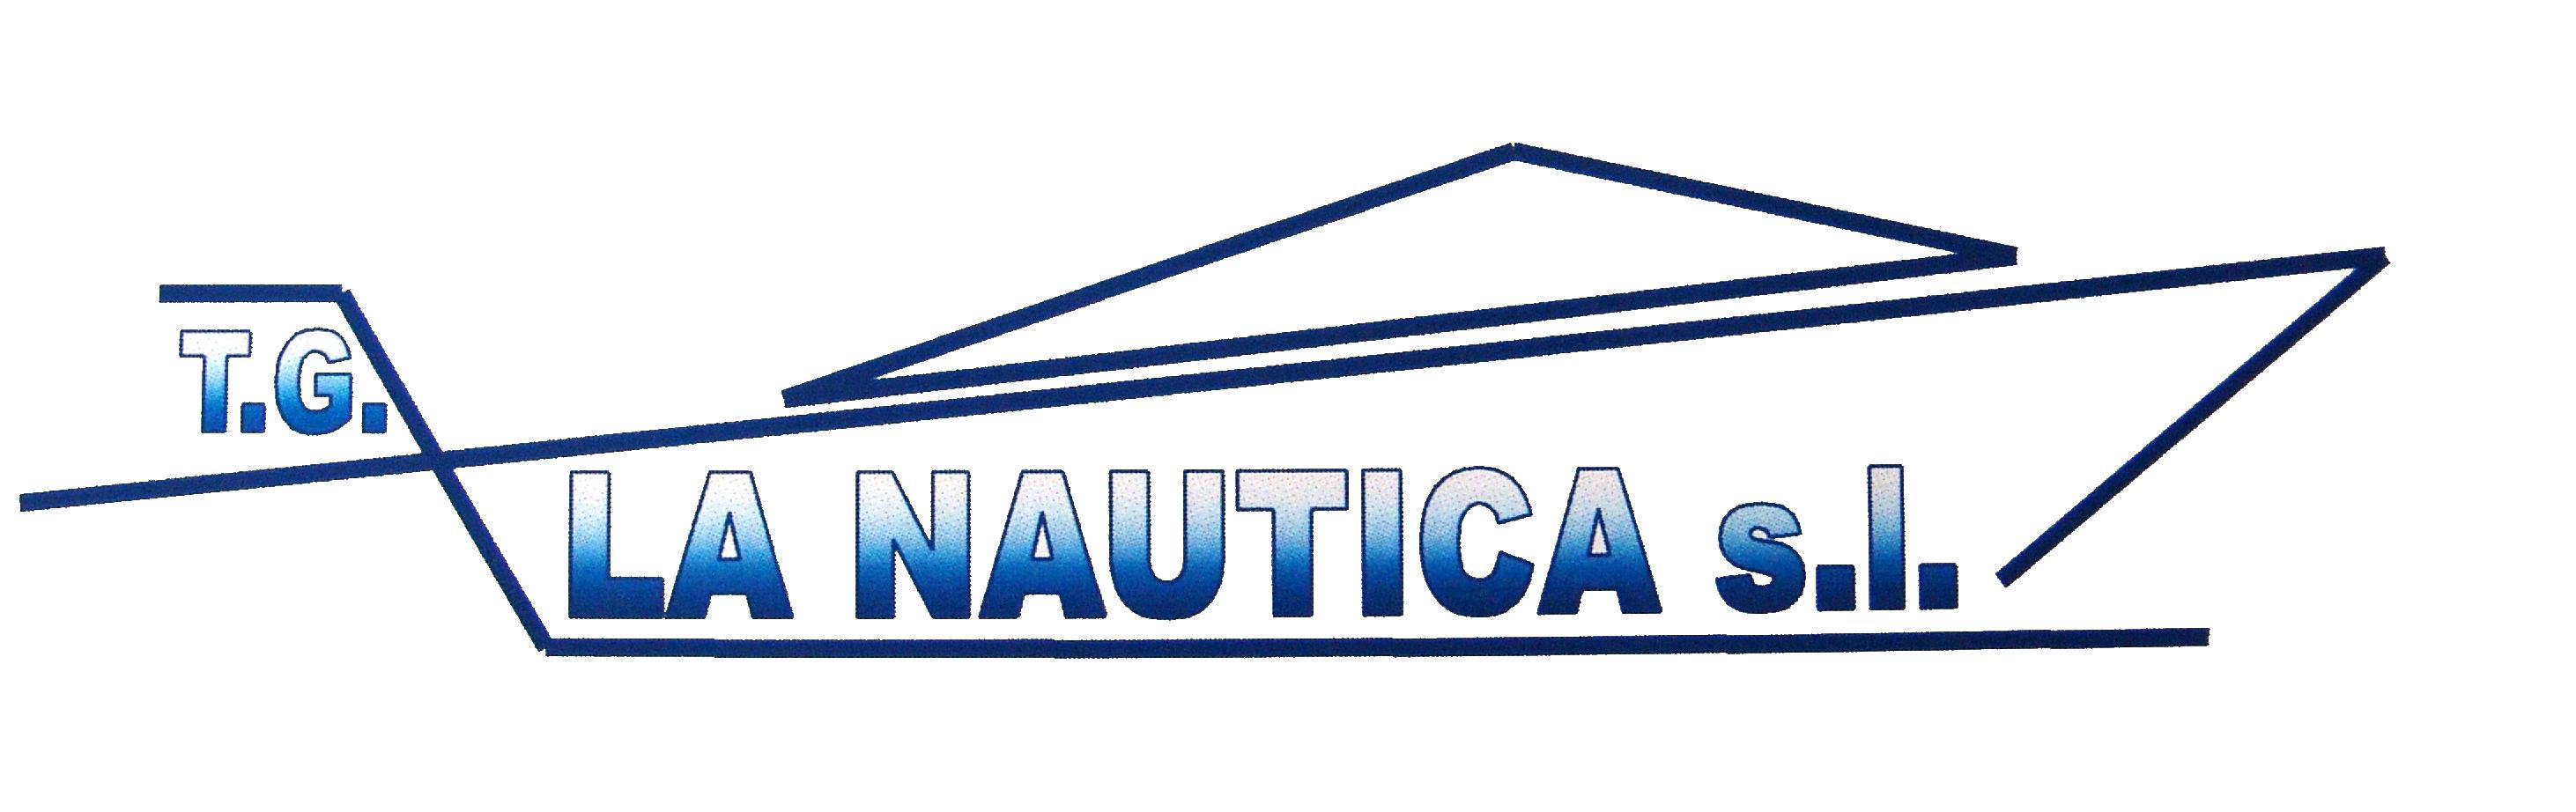 tglanautica